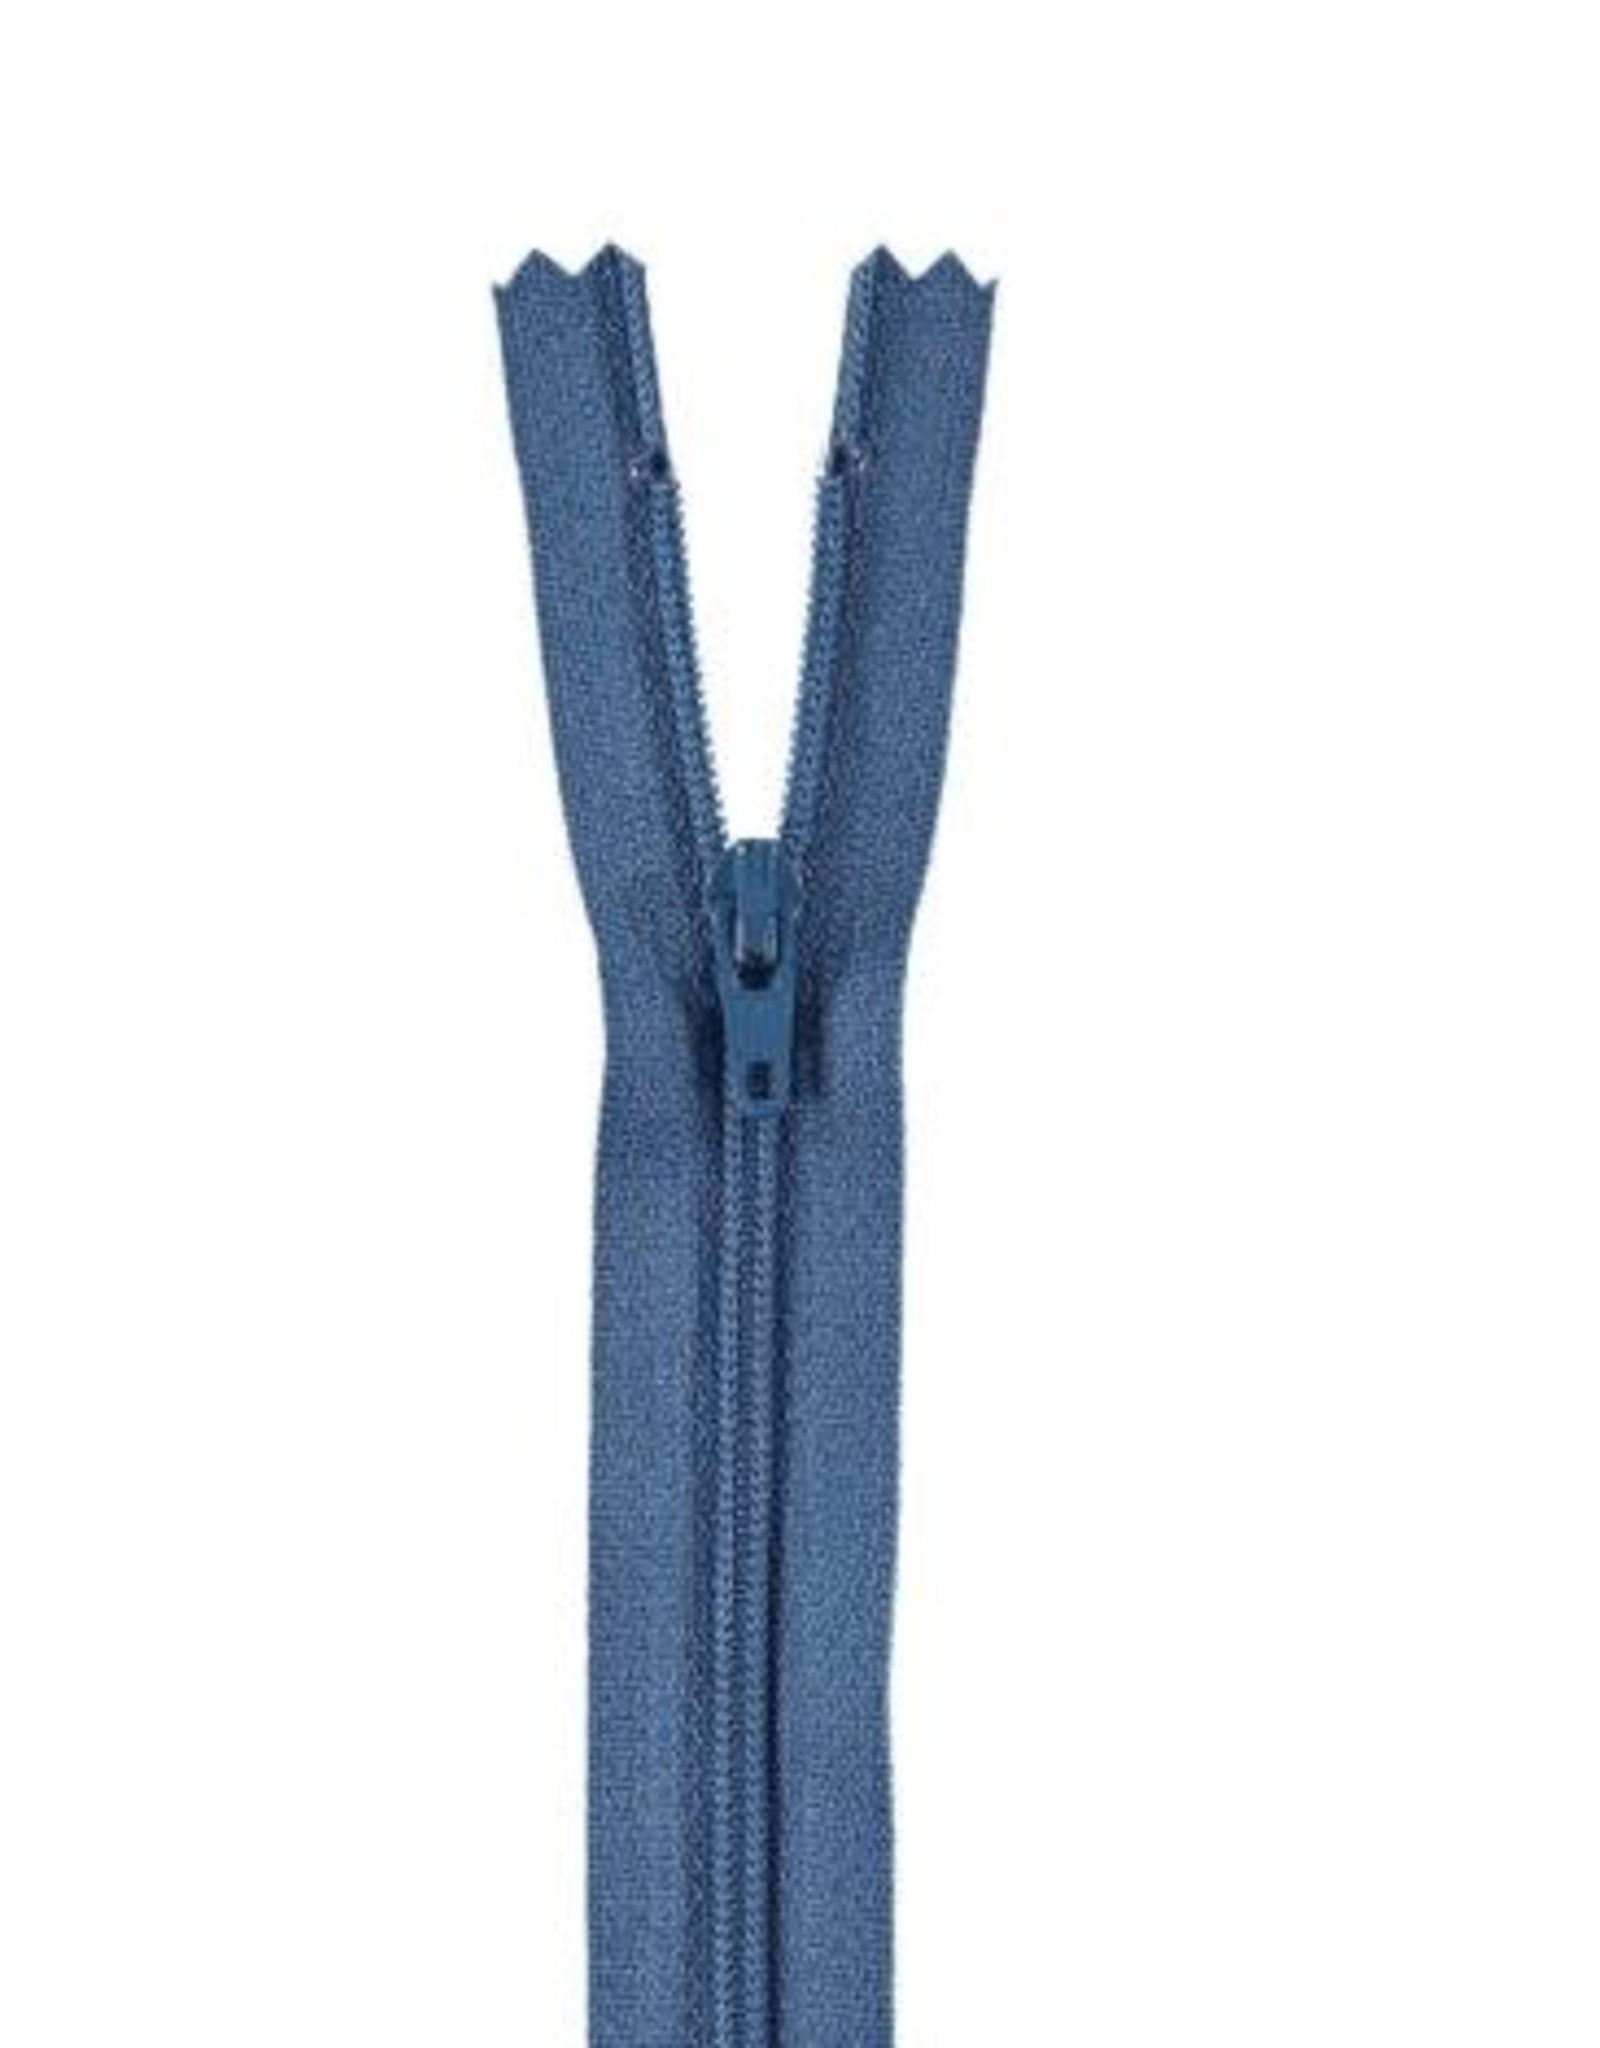 YKK Spiraalrits niet-DB 3mm jeansblauw 839-12cm